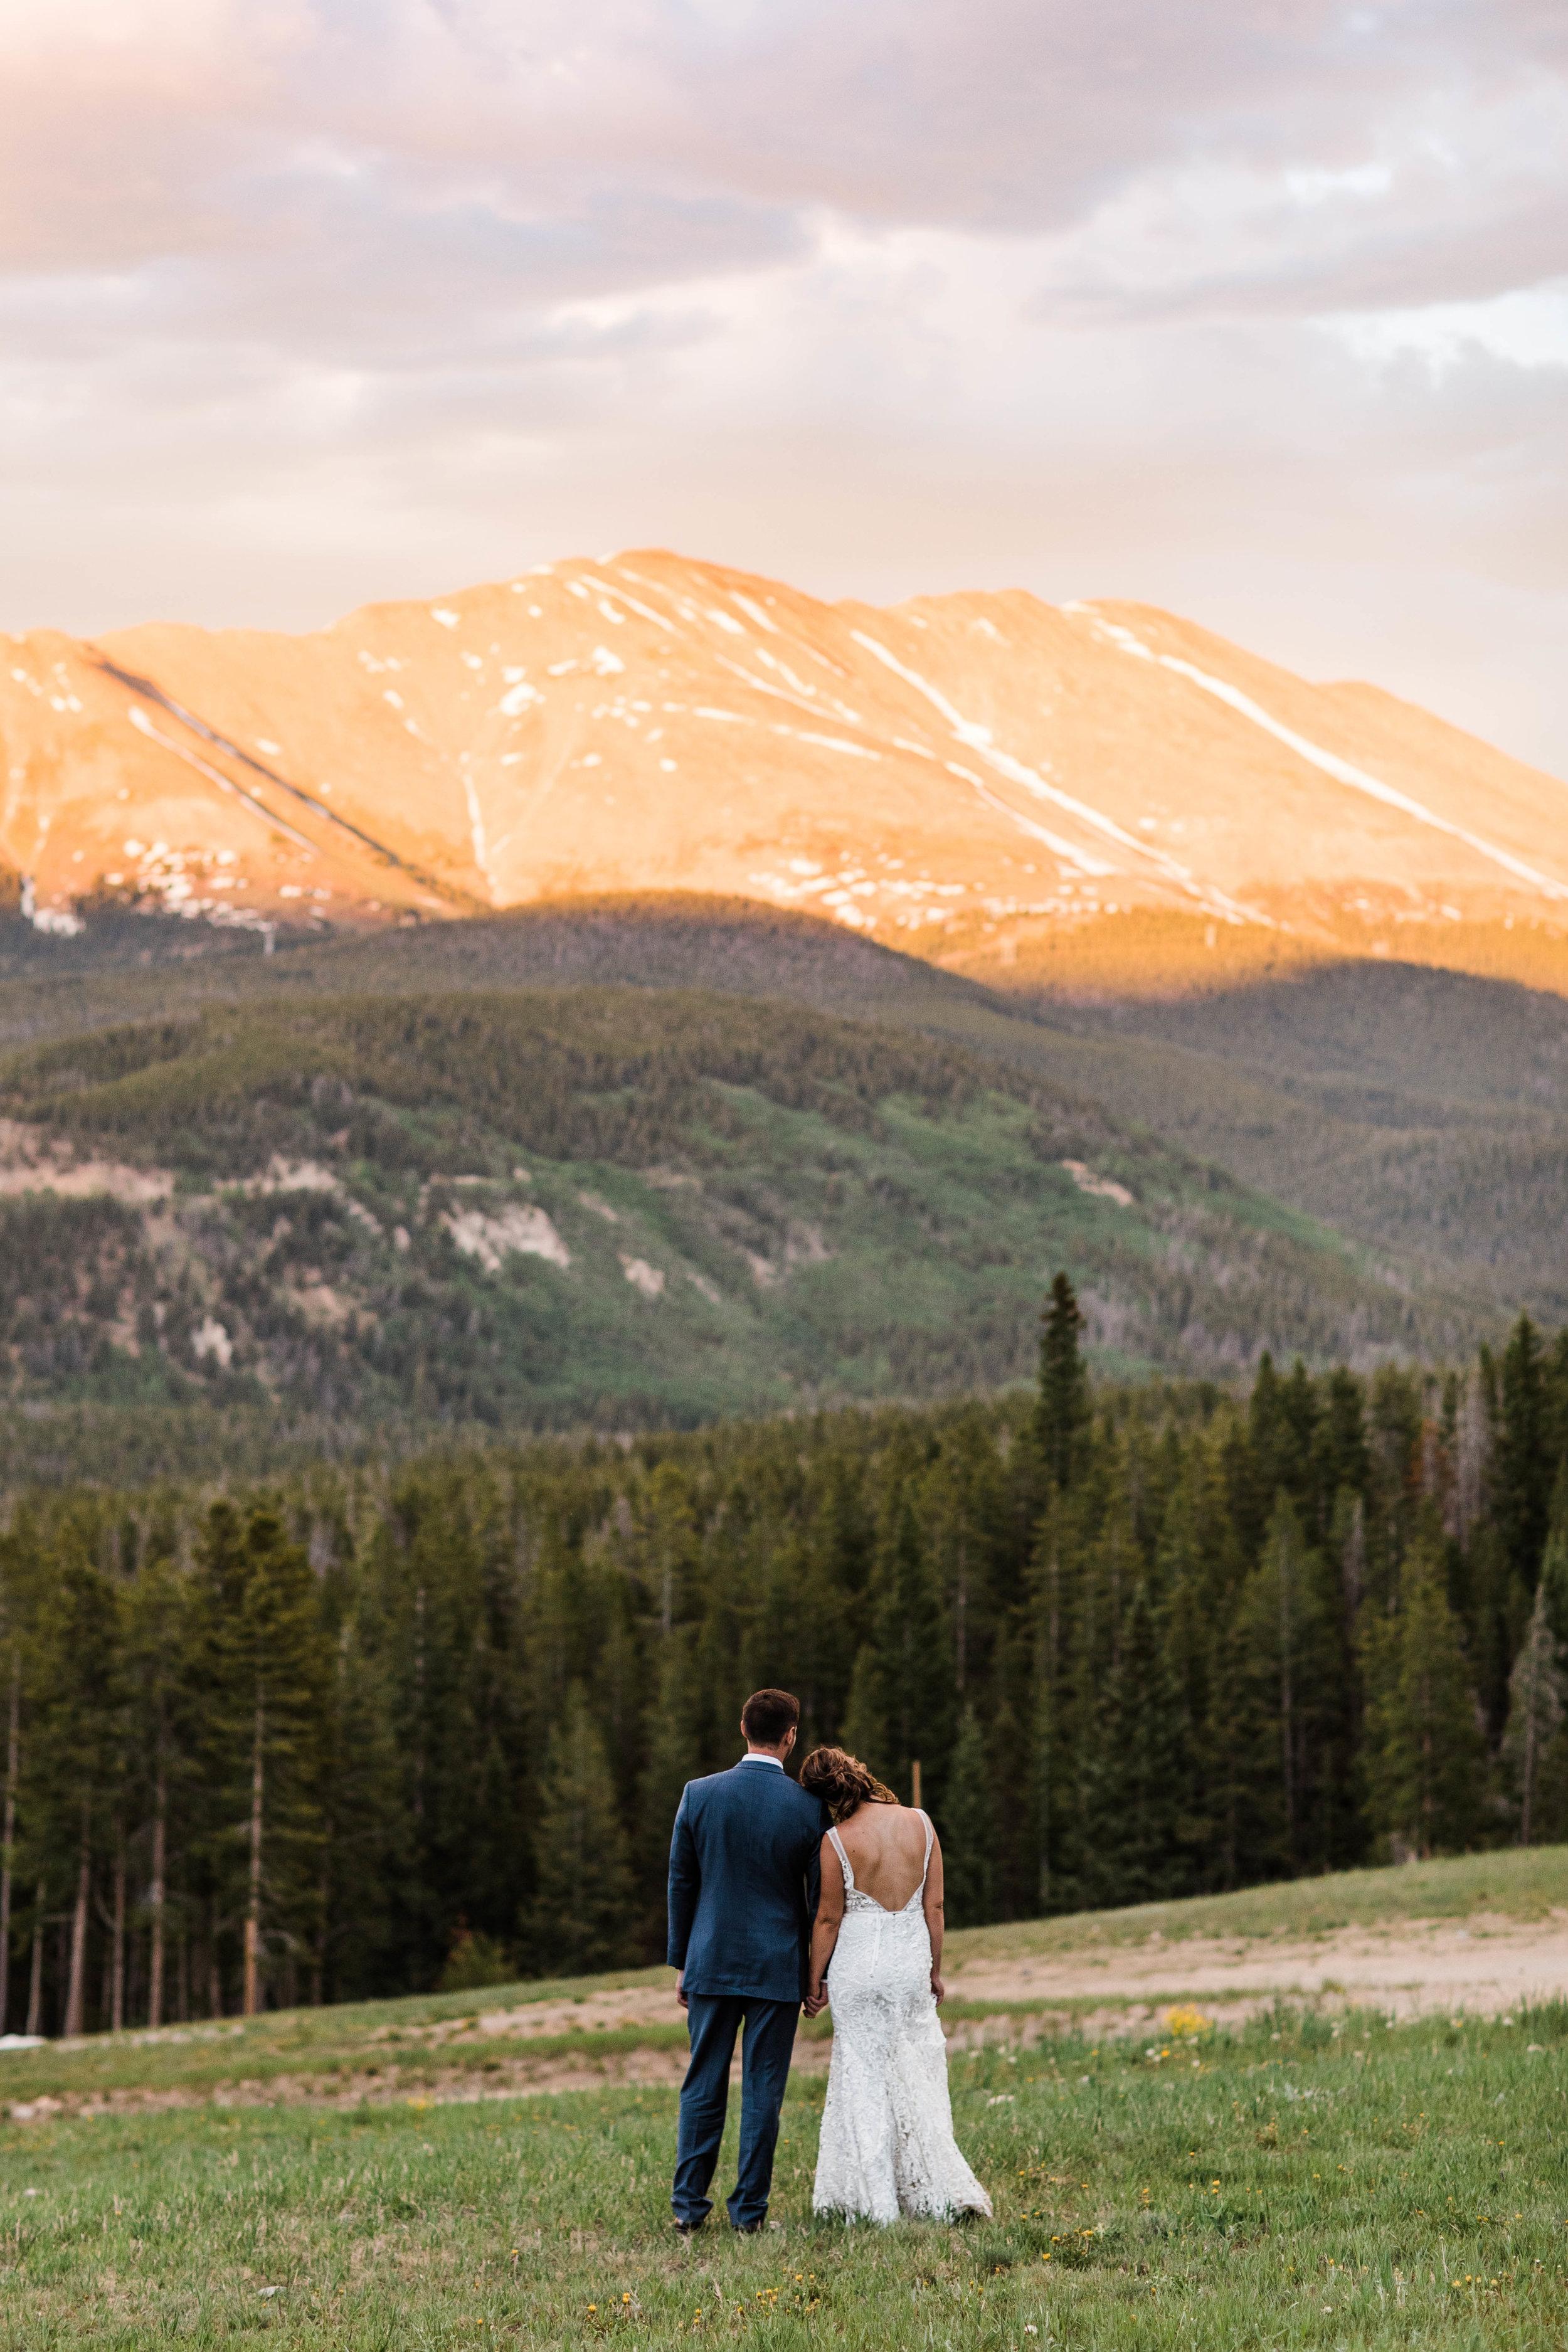 Adventure elopement in Breckenridge, Colorado at sunset